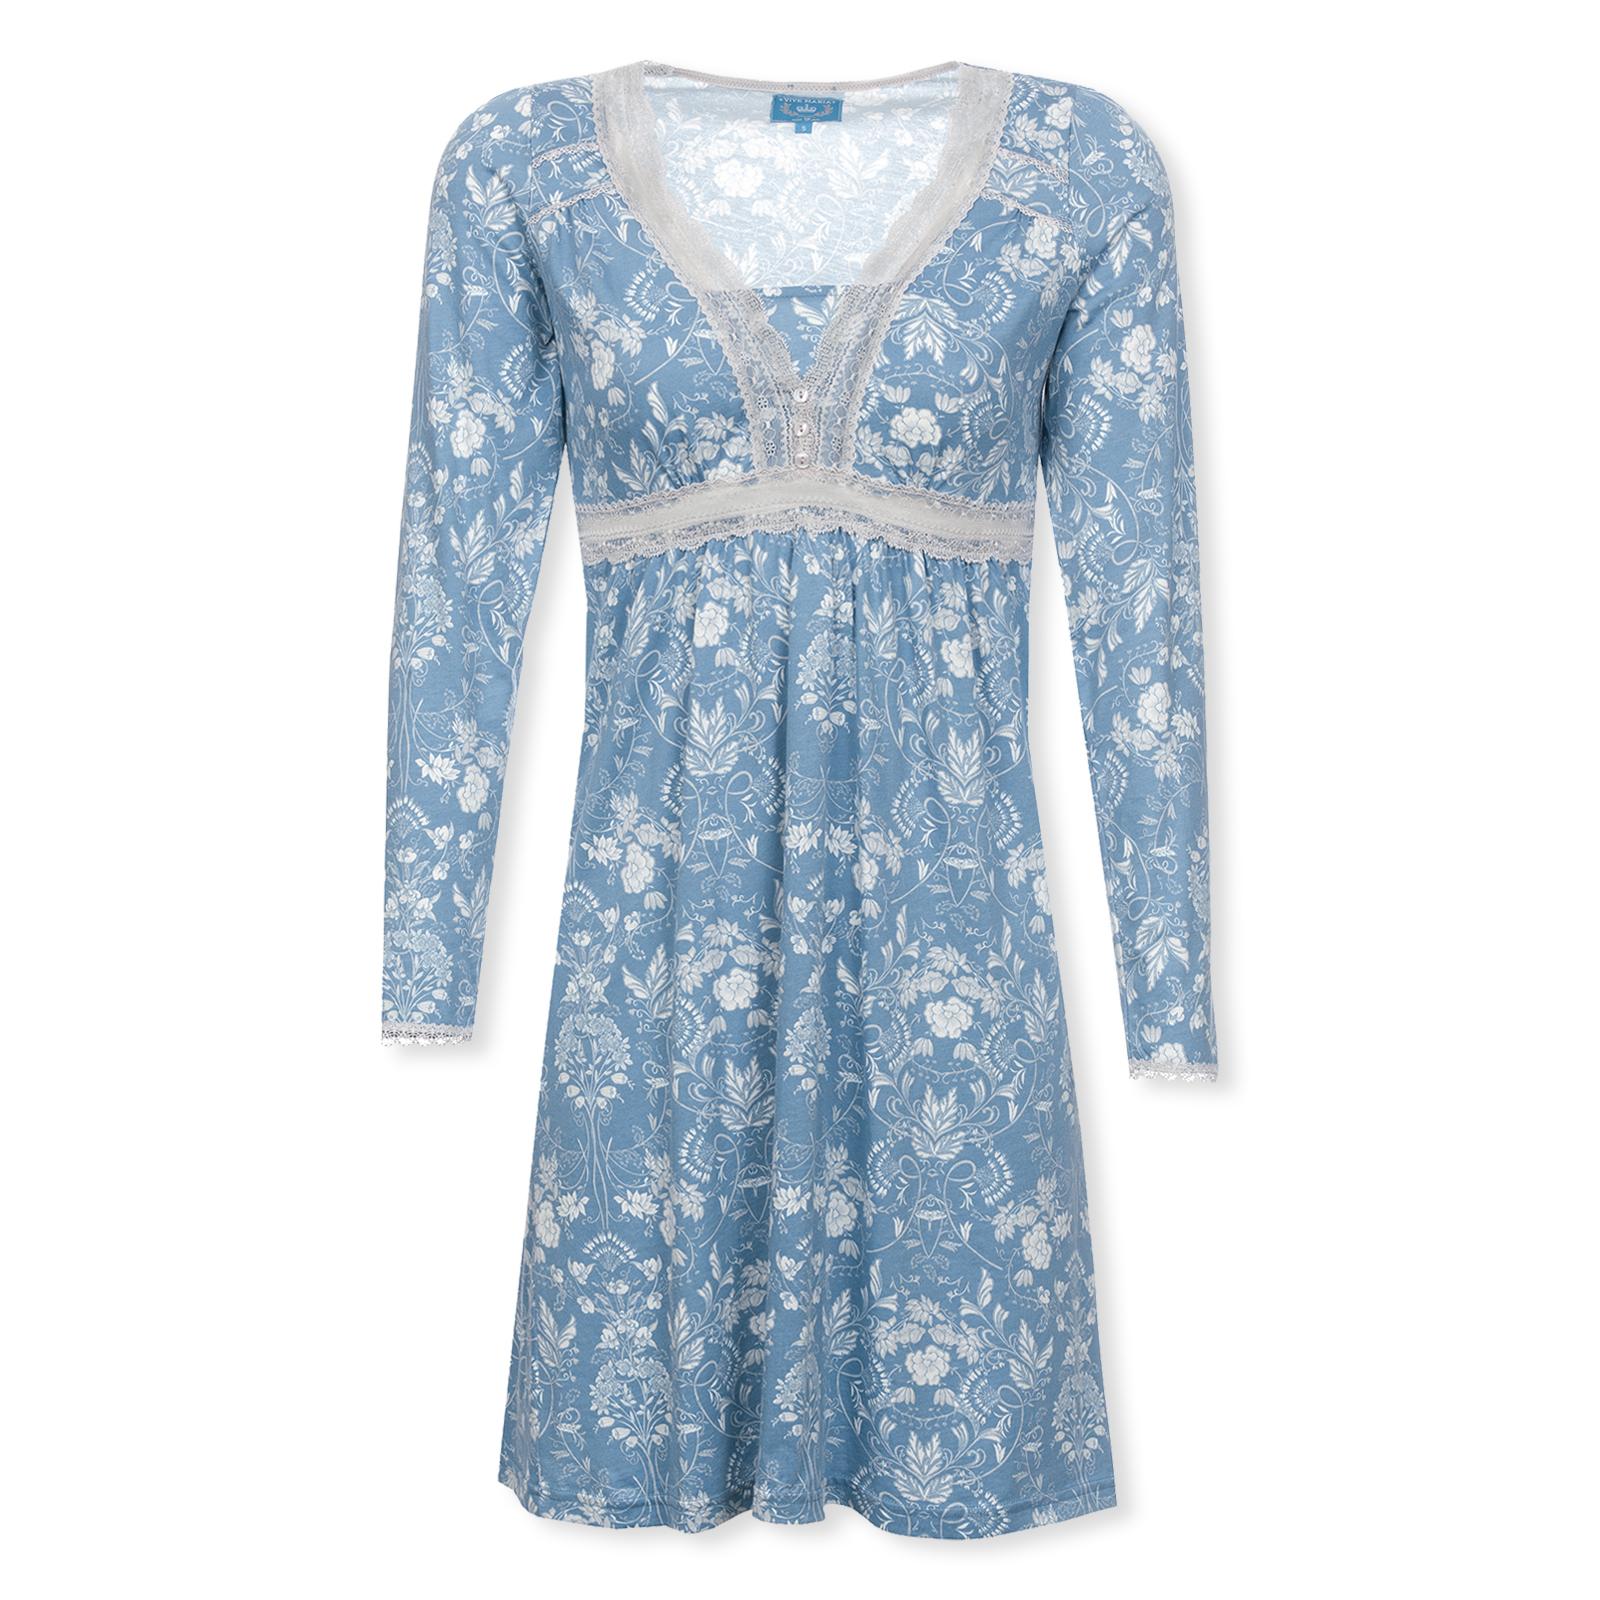 VIVE MARIA Nachthemd Sleepshirt langarm Blue Barock S M L XL in blue allover